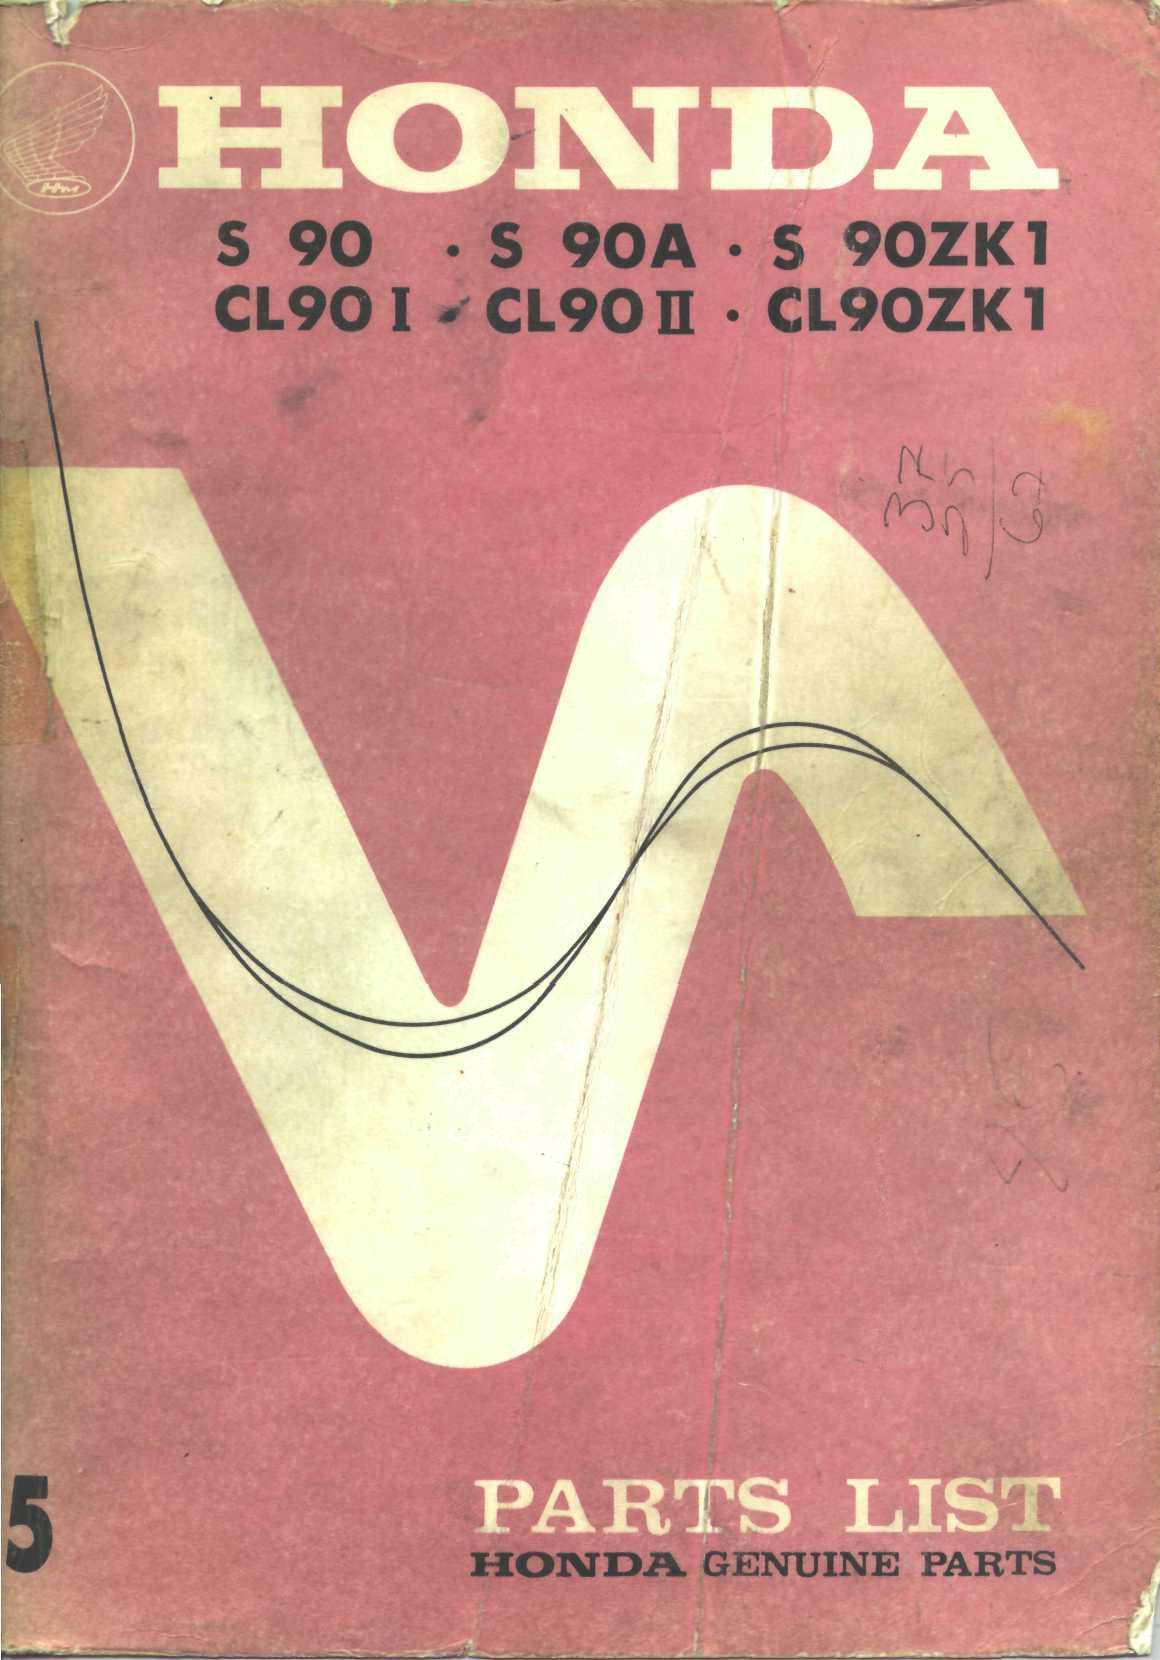 Workshopmanual for Honda S90A (1972)